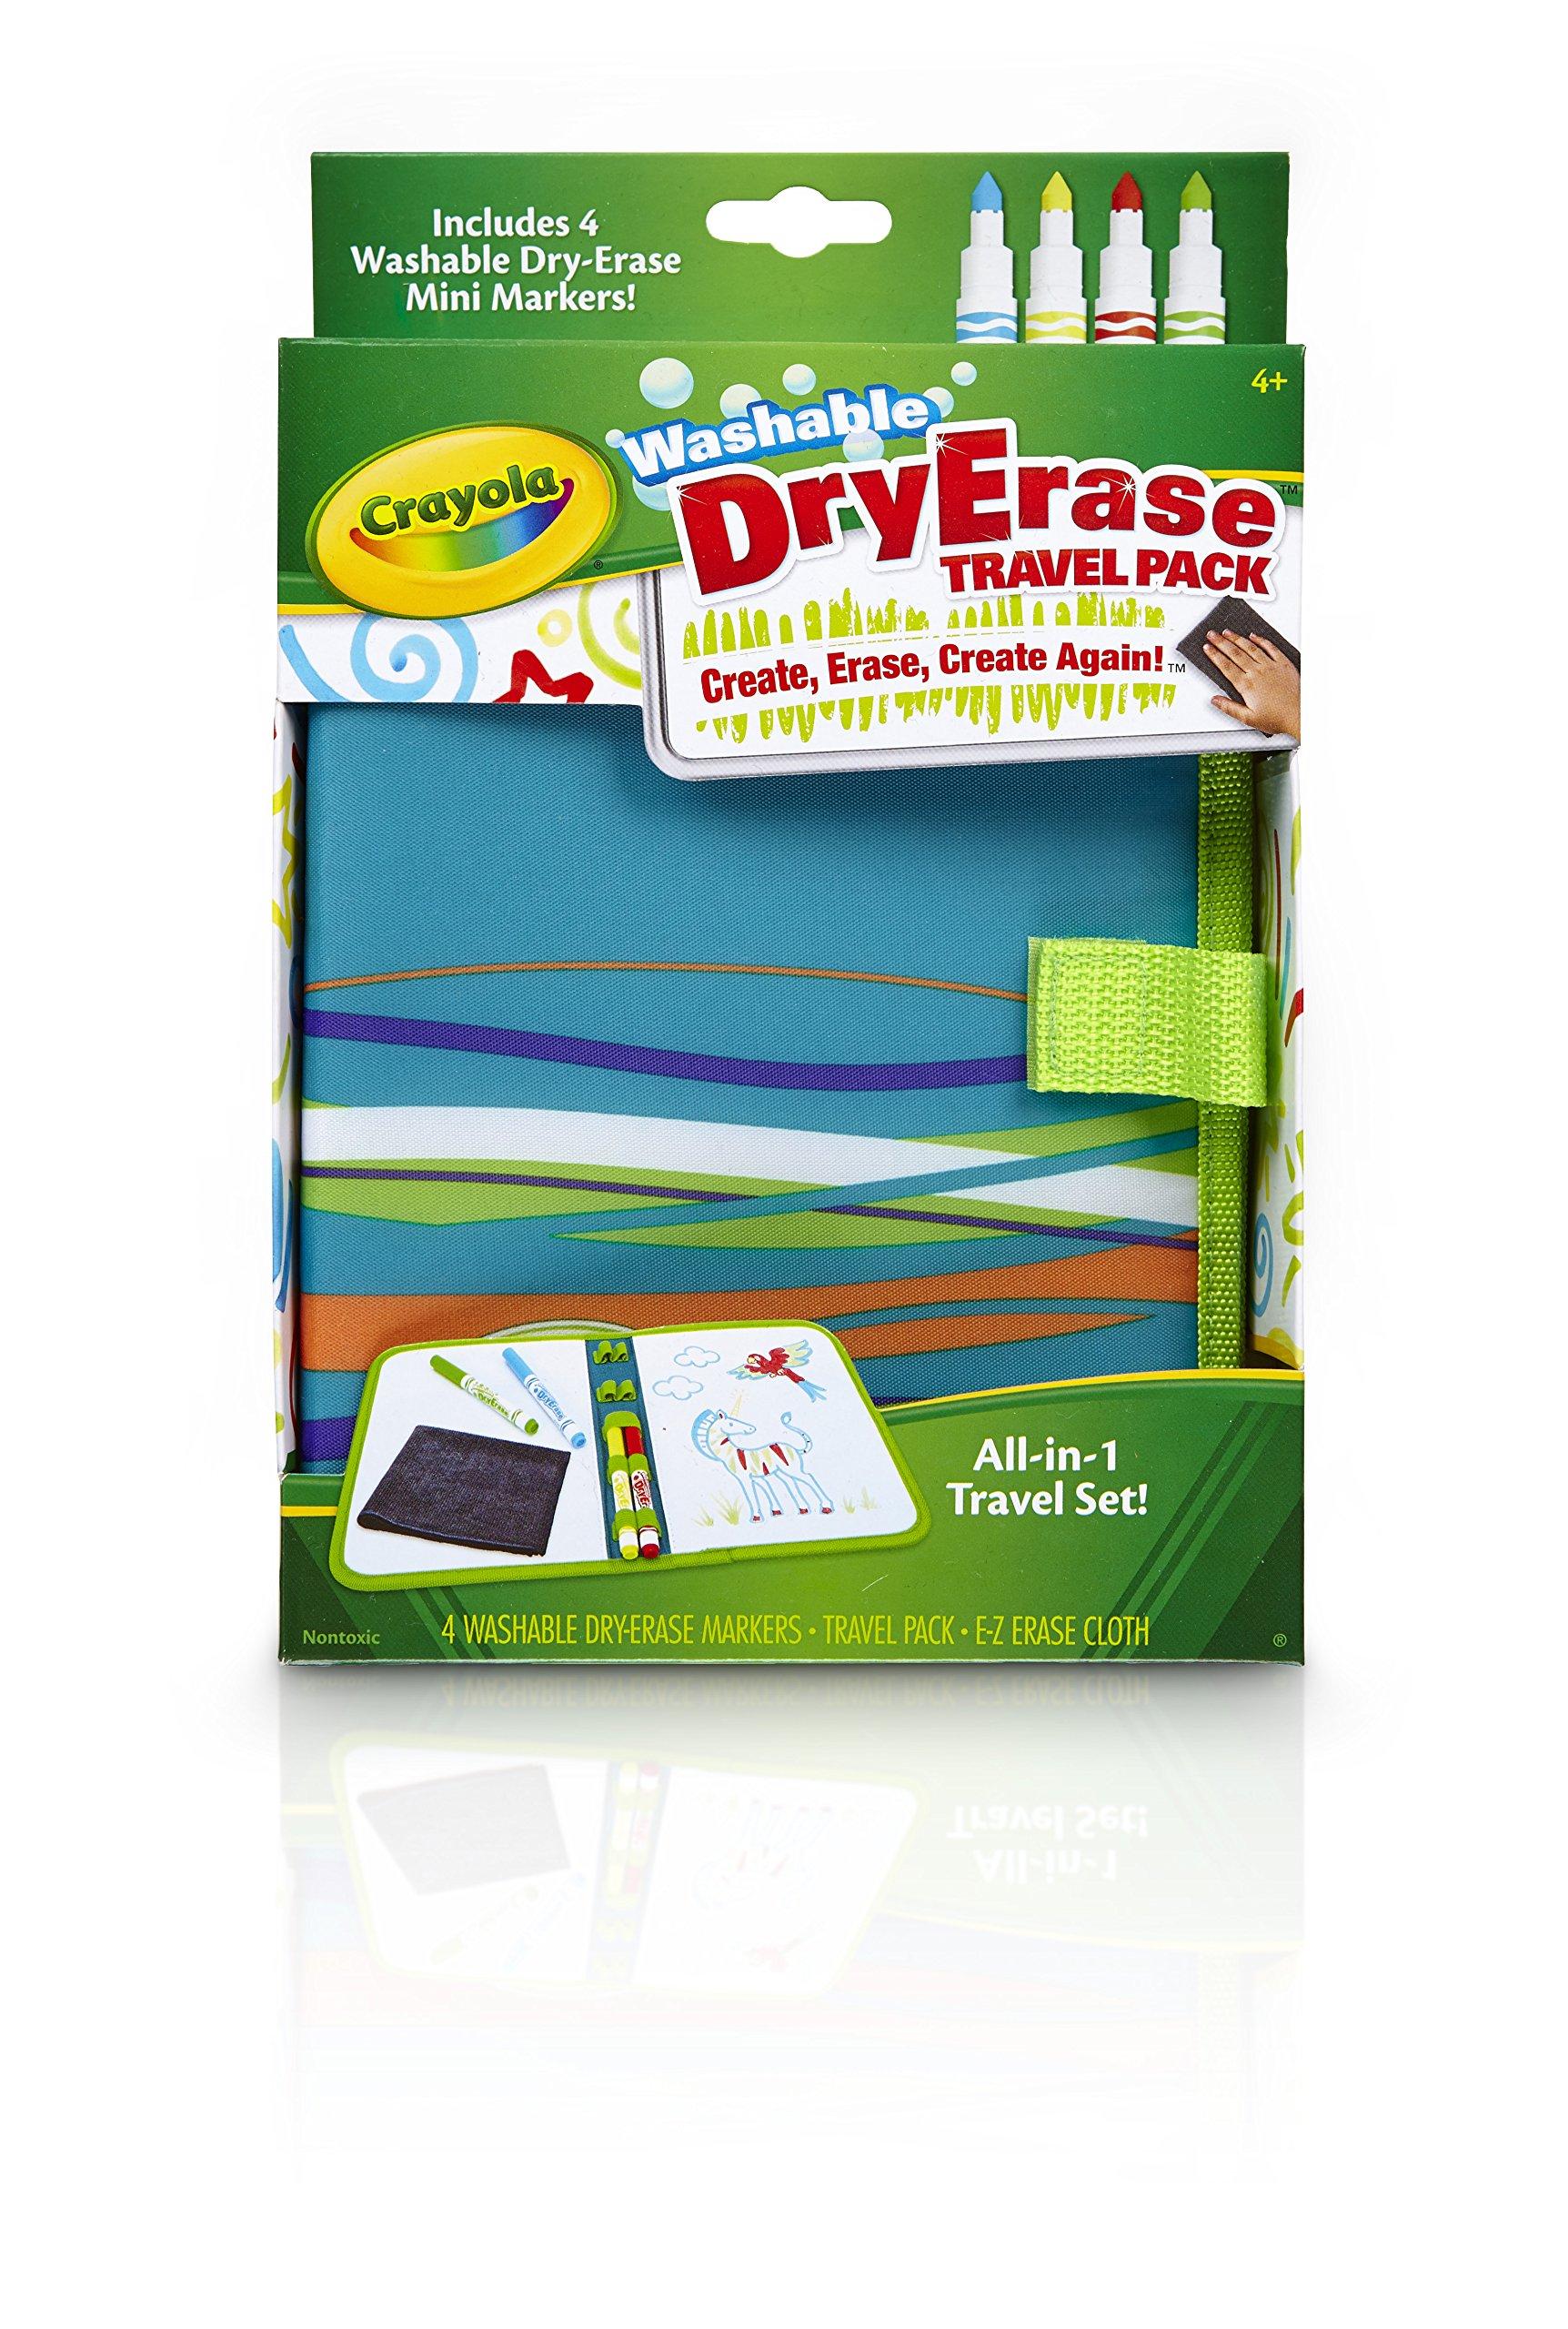 Crayola Dry-Erase Travel Pack by Crayola (Image #3)